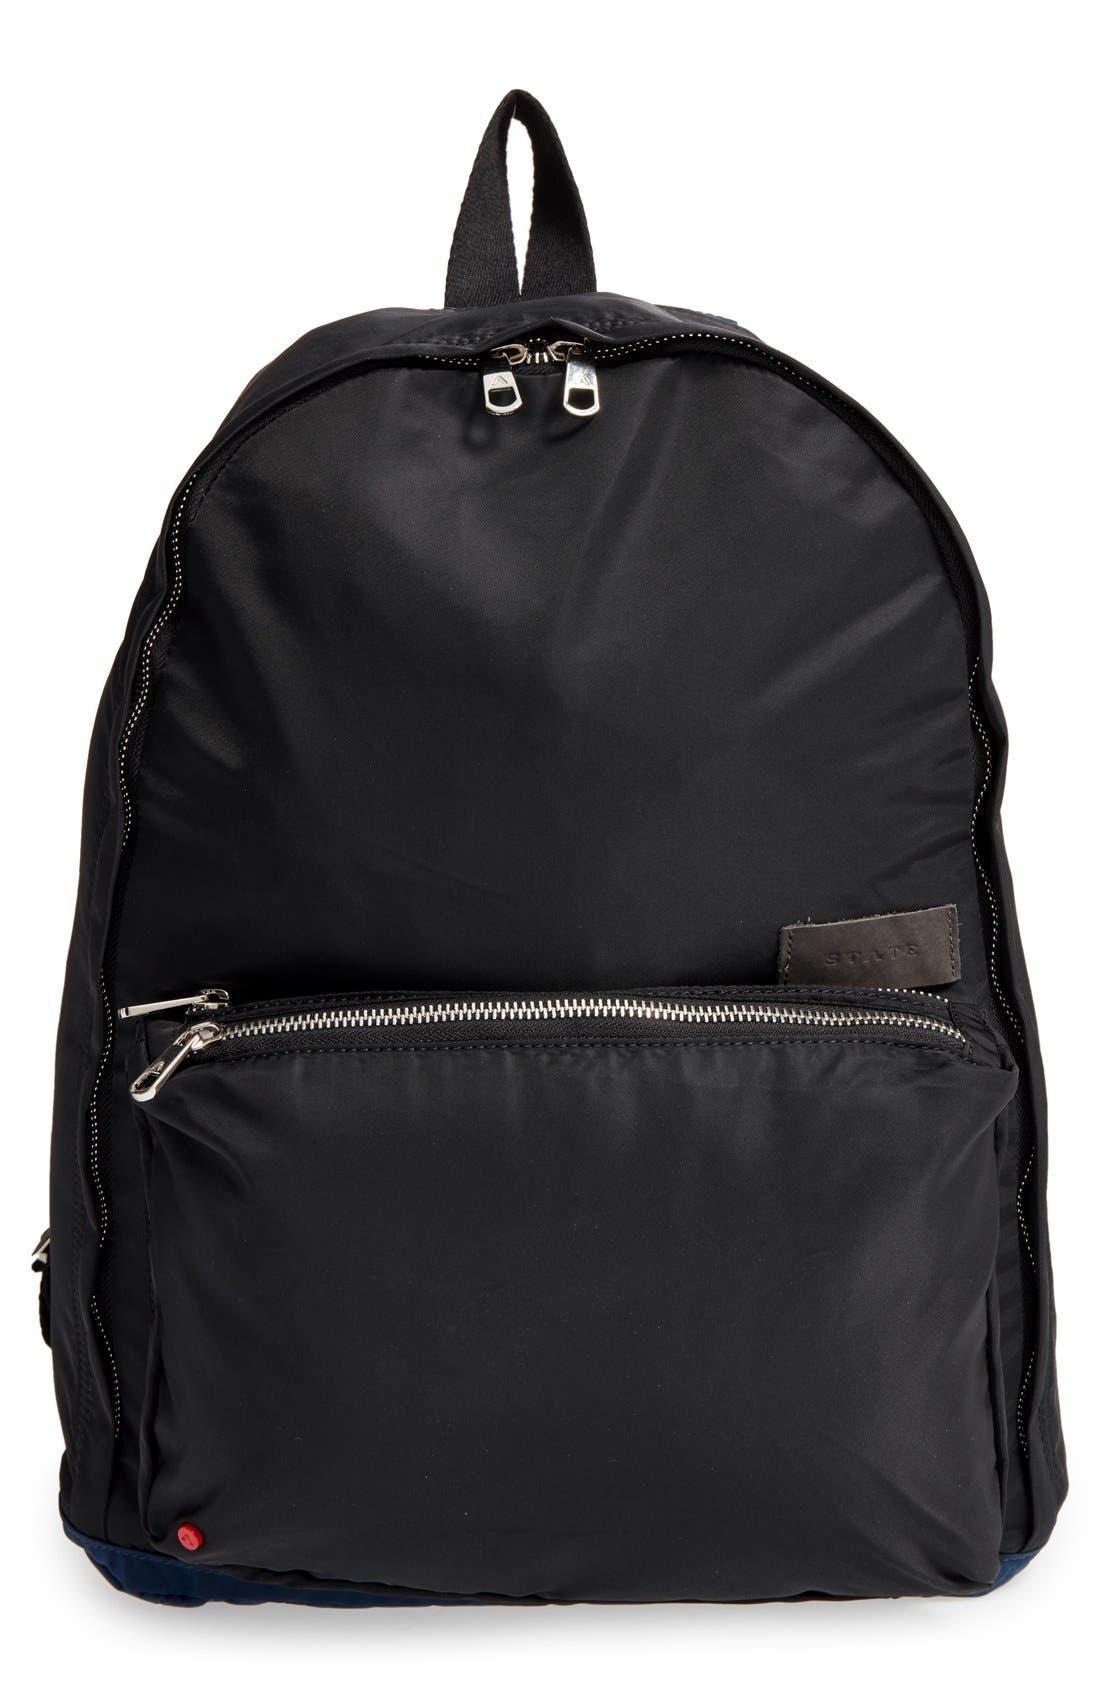 The Heights Adams Backpack,                             Main thumbnail 1, color,                             Black/ Navy